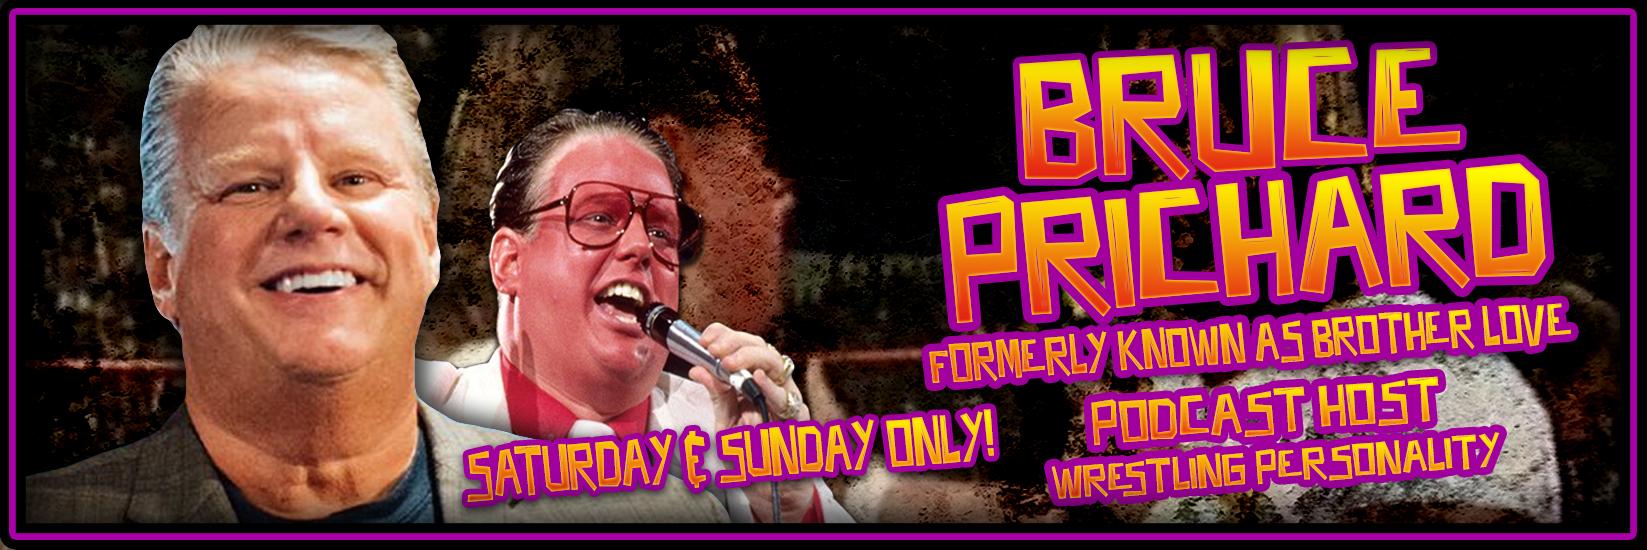 Bruce-Prichard-Banner-Sat-&-Sun-Only.png